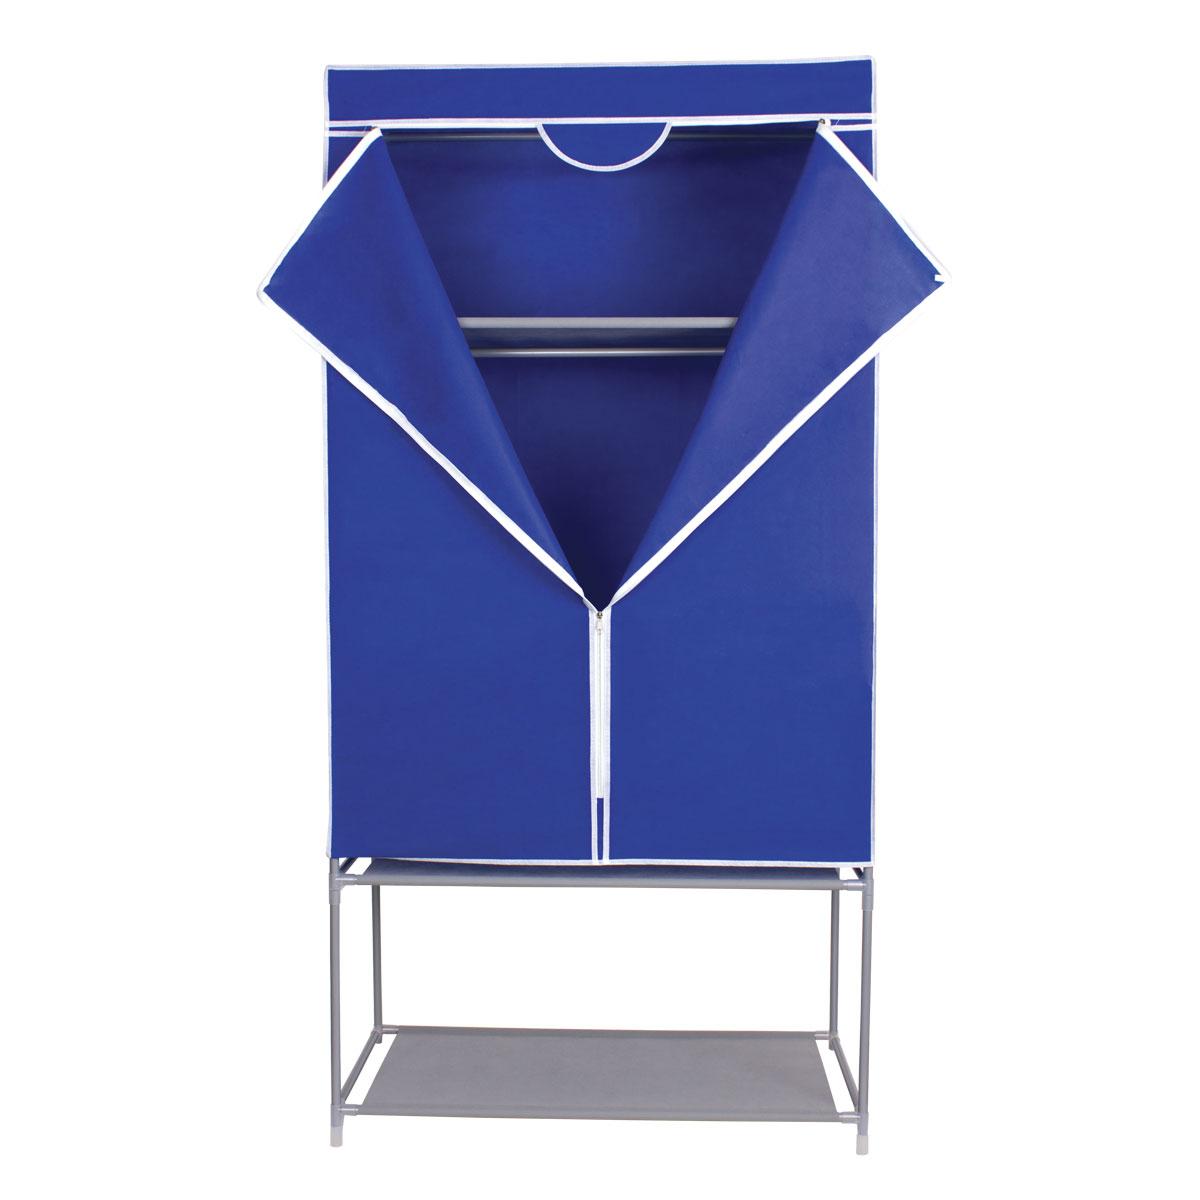 Гардероб для хранения одежды Miolla, цвет: синий, 175 х 87 х 46 см интмагазин пластик полку для обуви